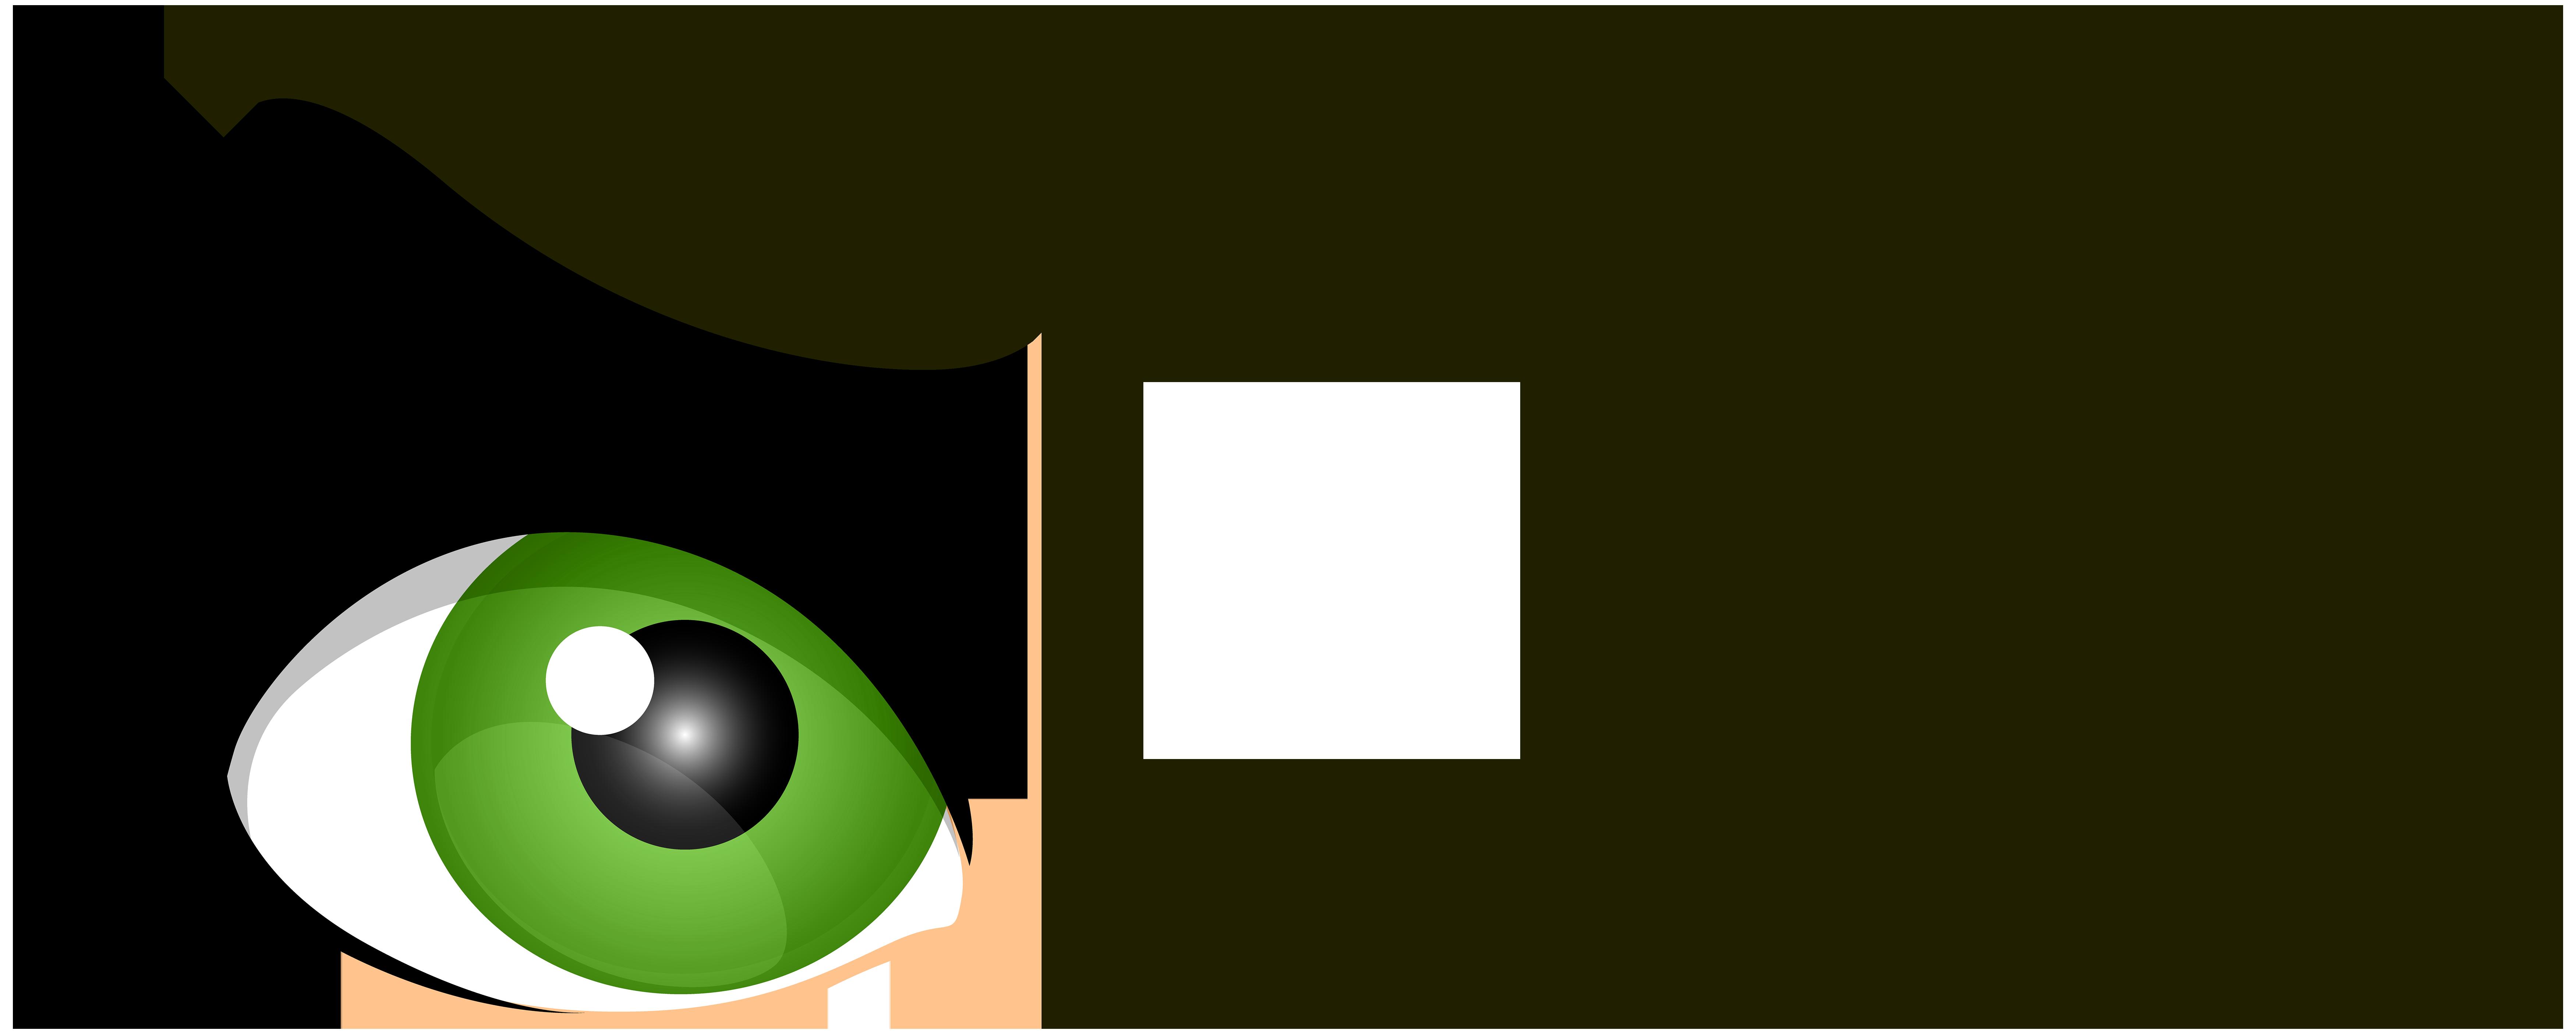 Green Winking Eyes PNG Clip Art.